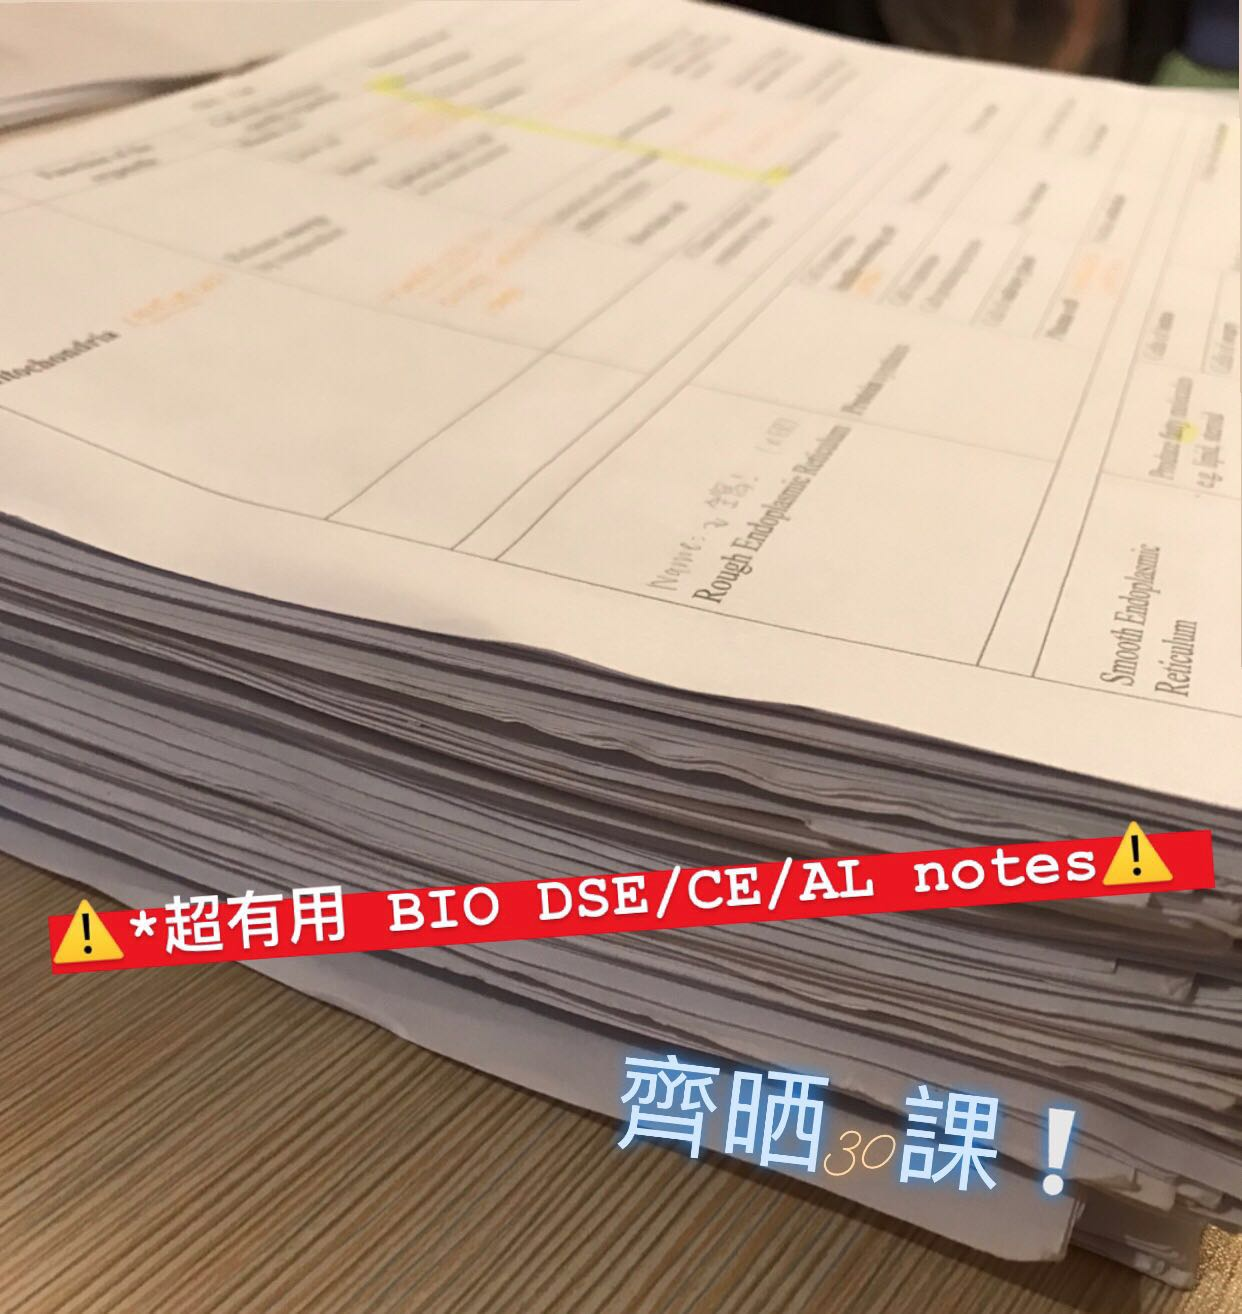 DSE BIO (dse/ce/Al) 齊全notes, 教科書 - Carousell